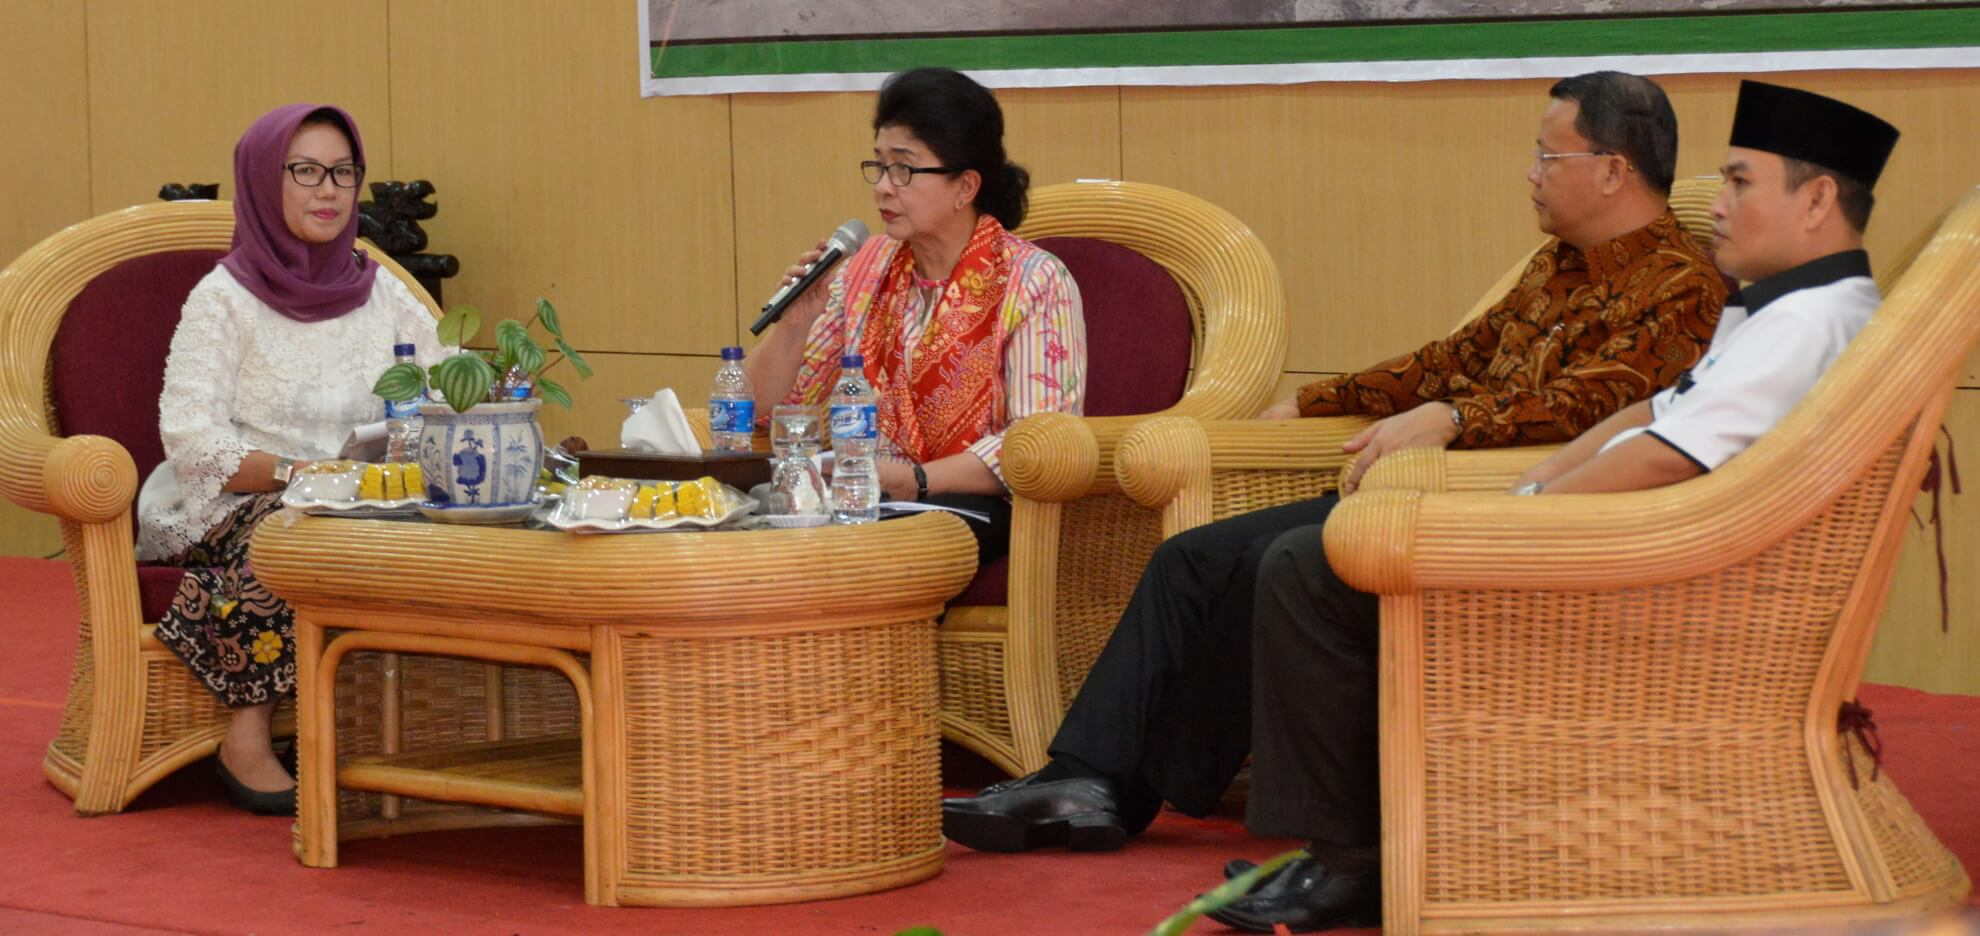 13-05-2017 Menkes Nila Moeloek Menyampaikan Potensi Gizi pada Bahan Pangan bersumber Ikan pada Dialog Rakerkesda Provinsi Bengkulu (R46)